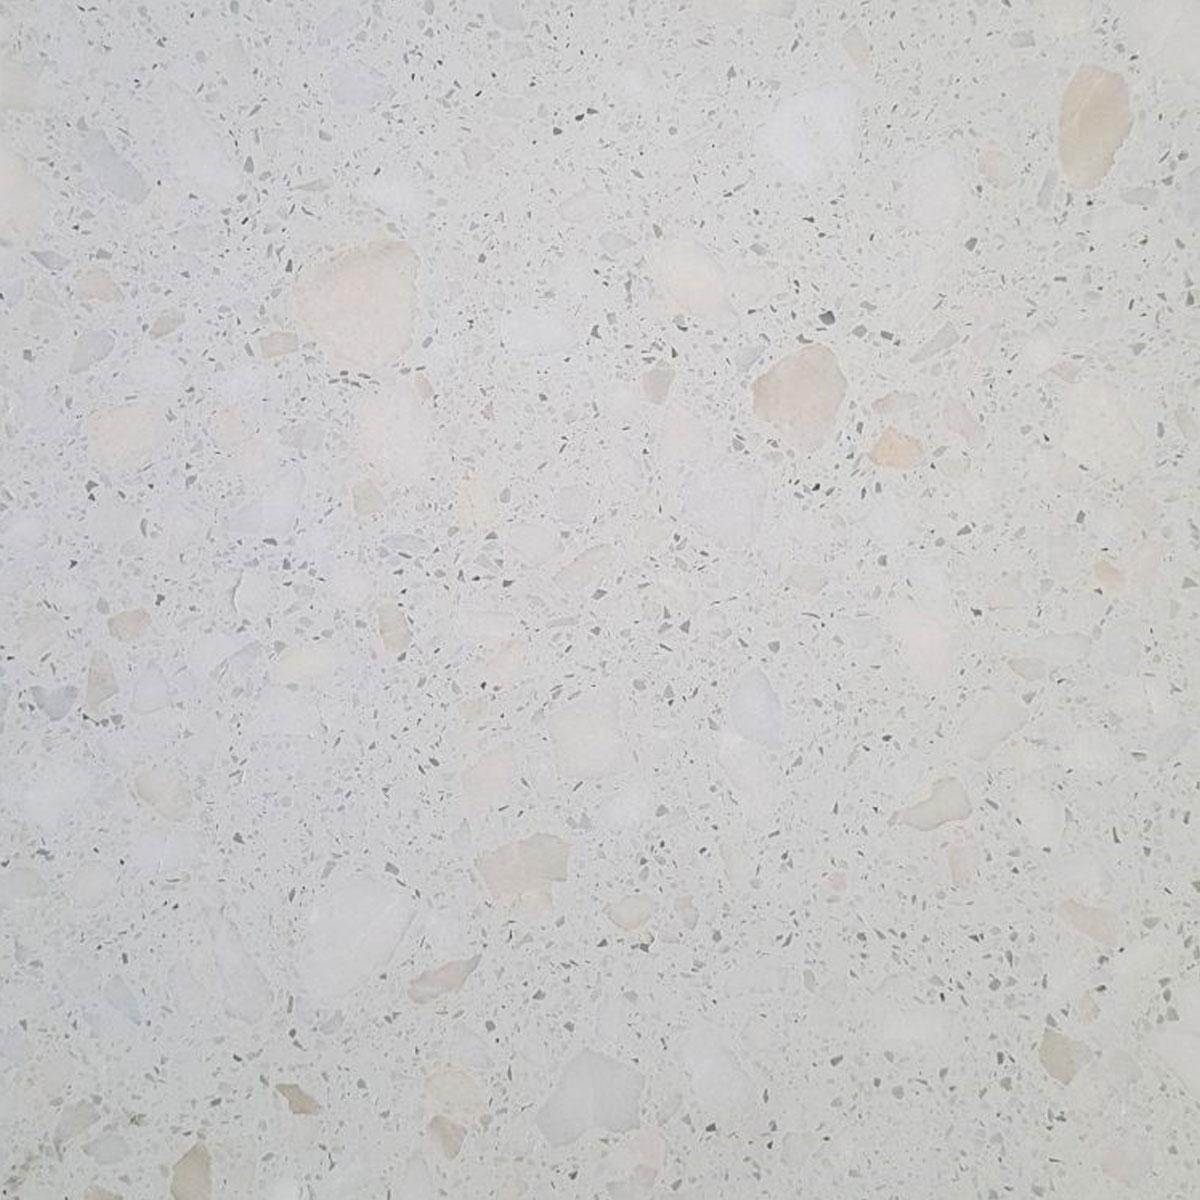 Terrazzo - Padovan Aleutian - Natural Stone Tiles - Stone3 Brisbane